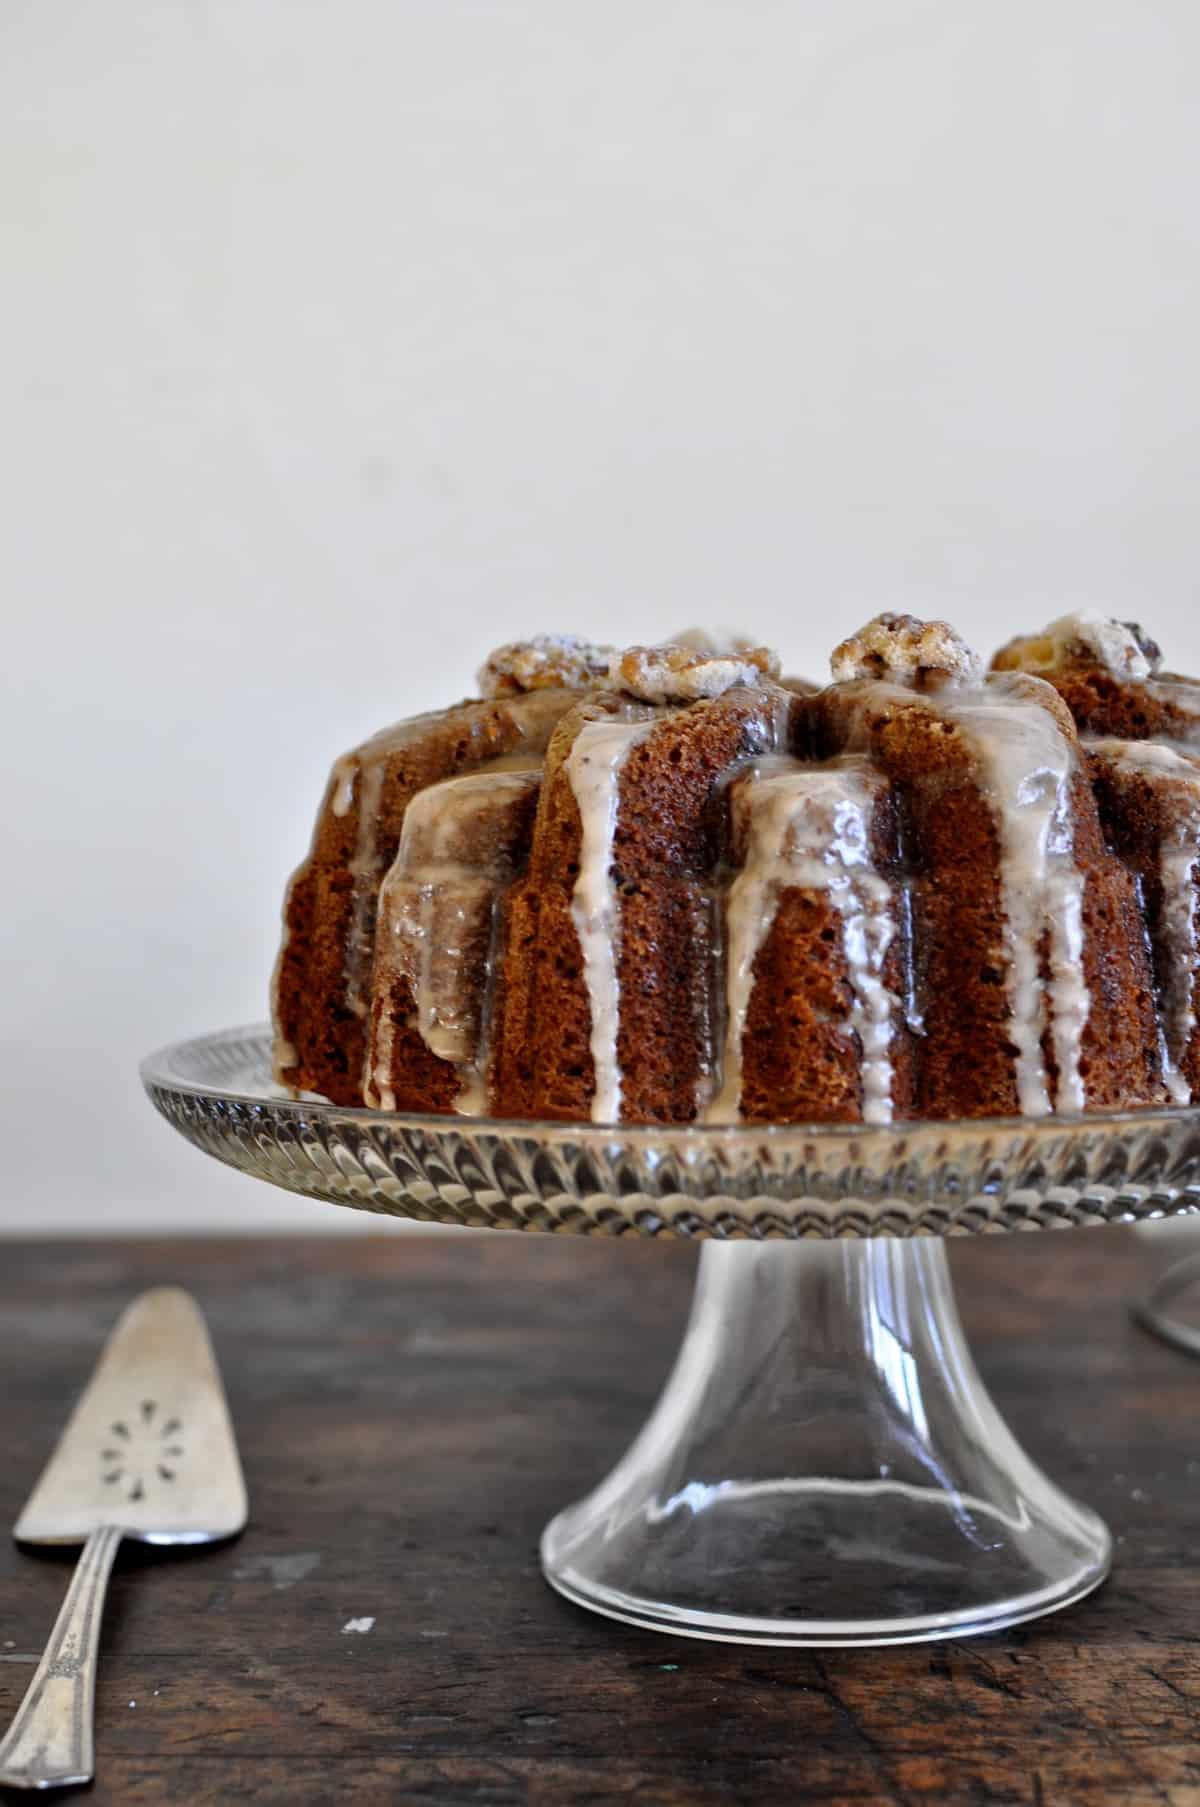 Olive Oil and Spiced Butternut Squash Bundt Cake with Cognac Vanilla Glaze